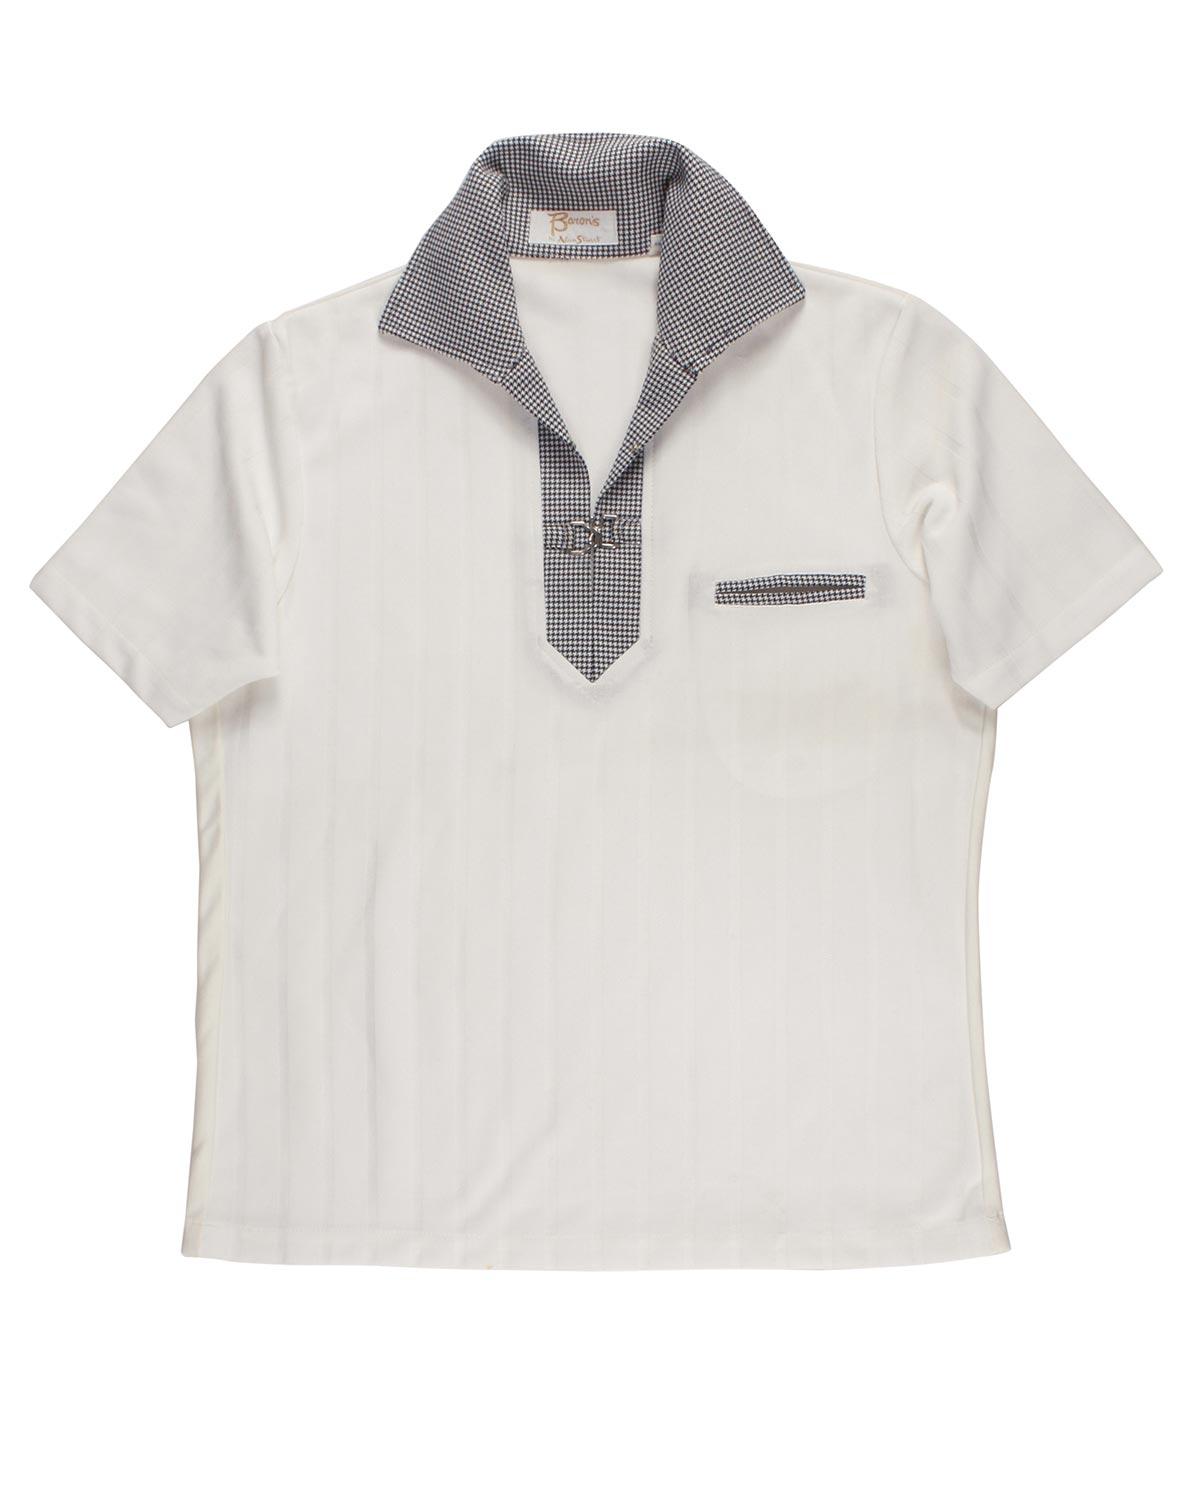 ALAN STUART synthetic fabric polo 50s